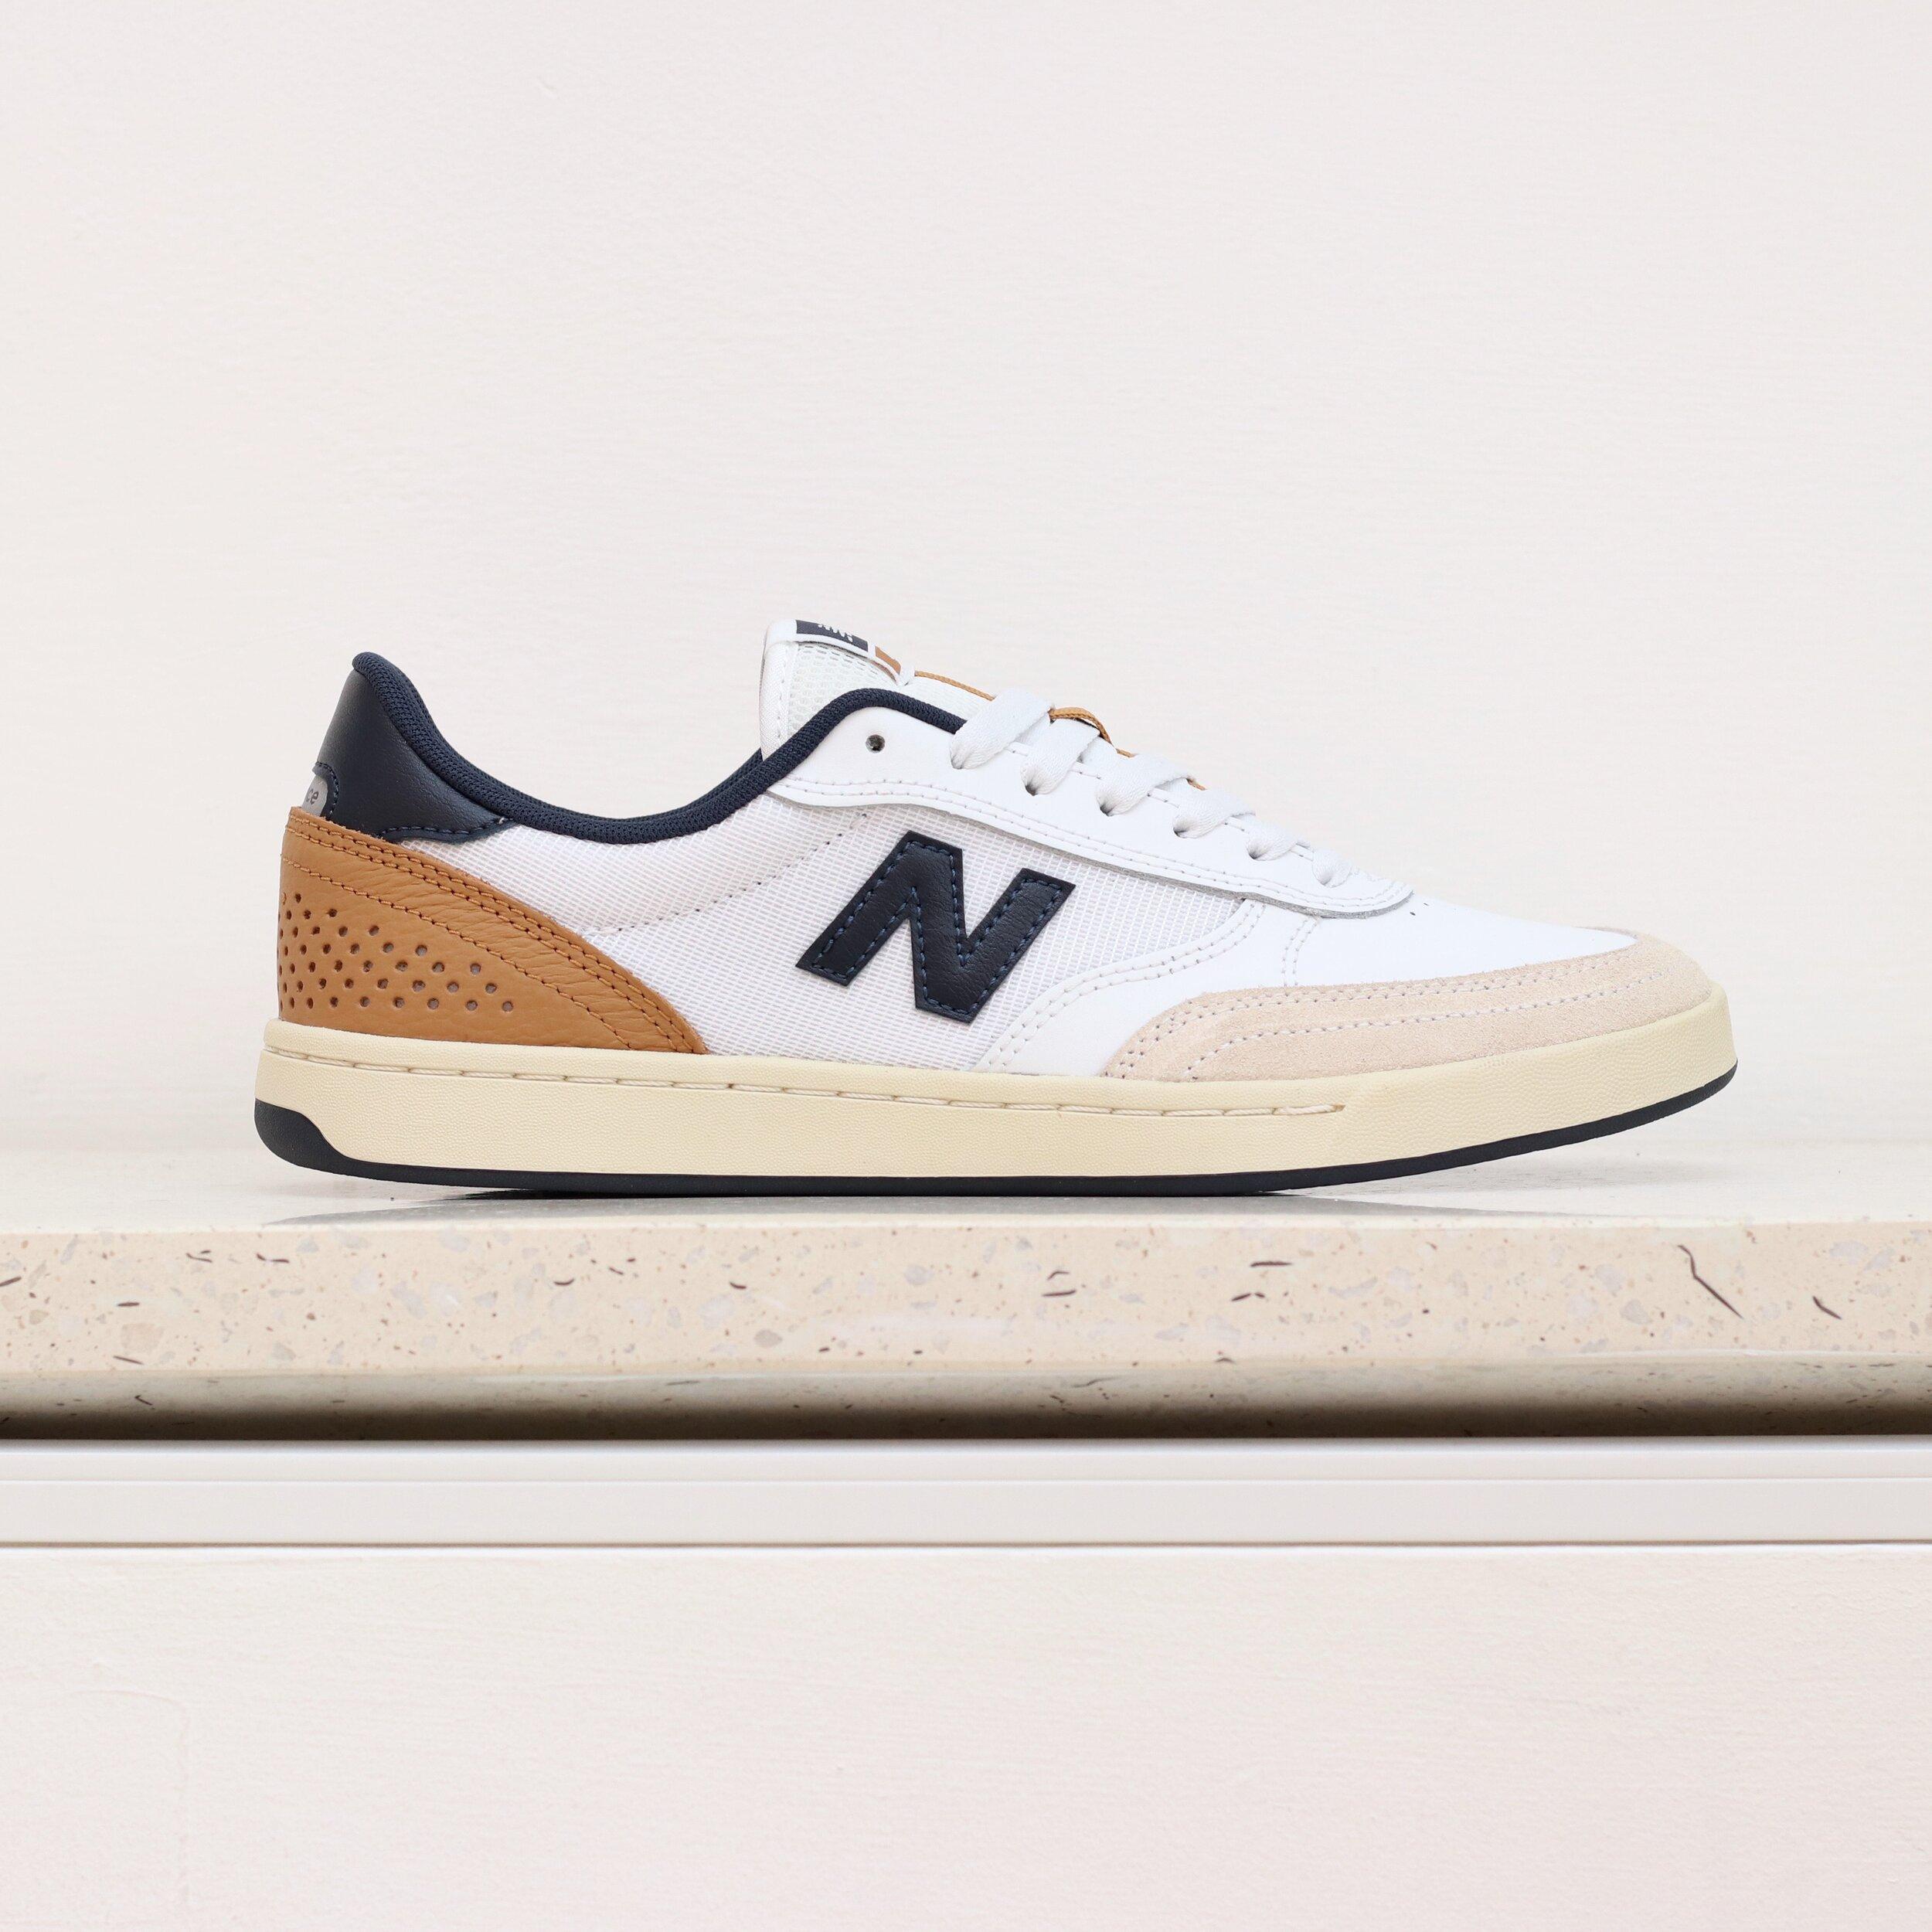 New Balance Numeric - 440 - White/Navy